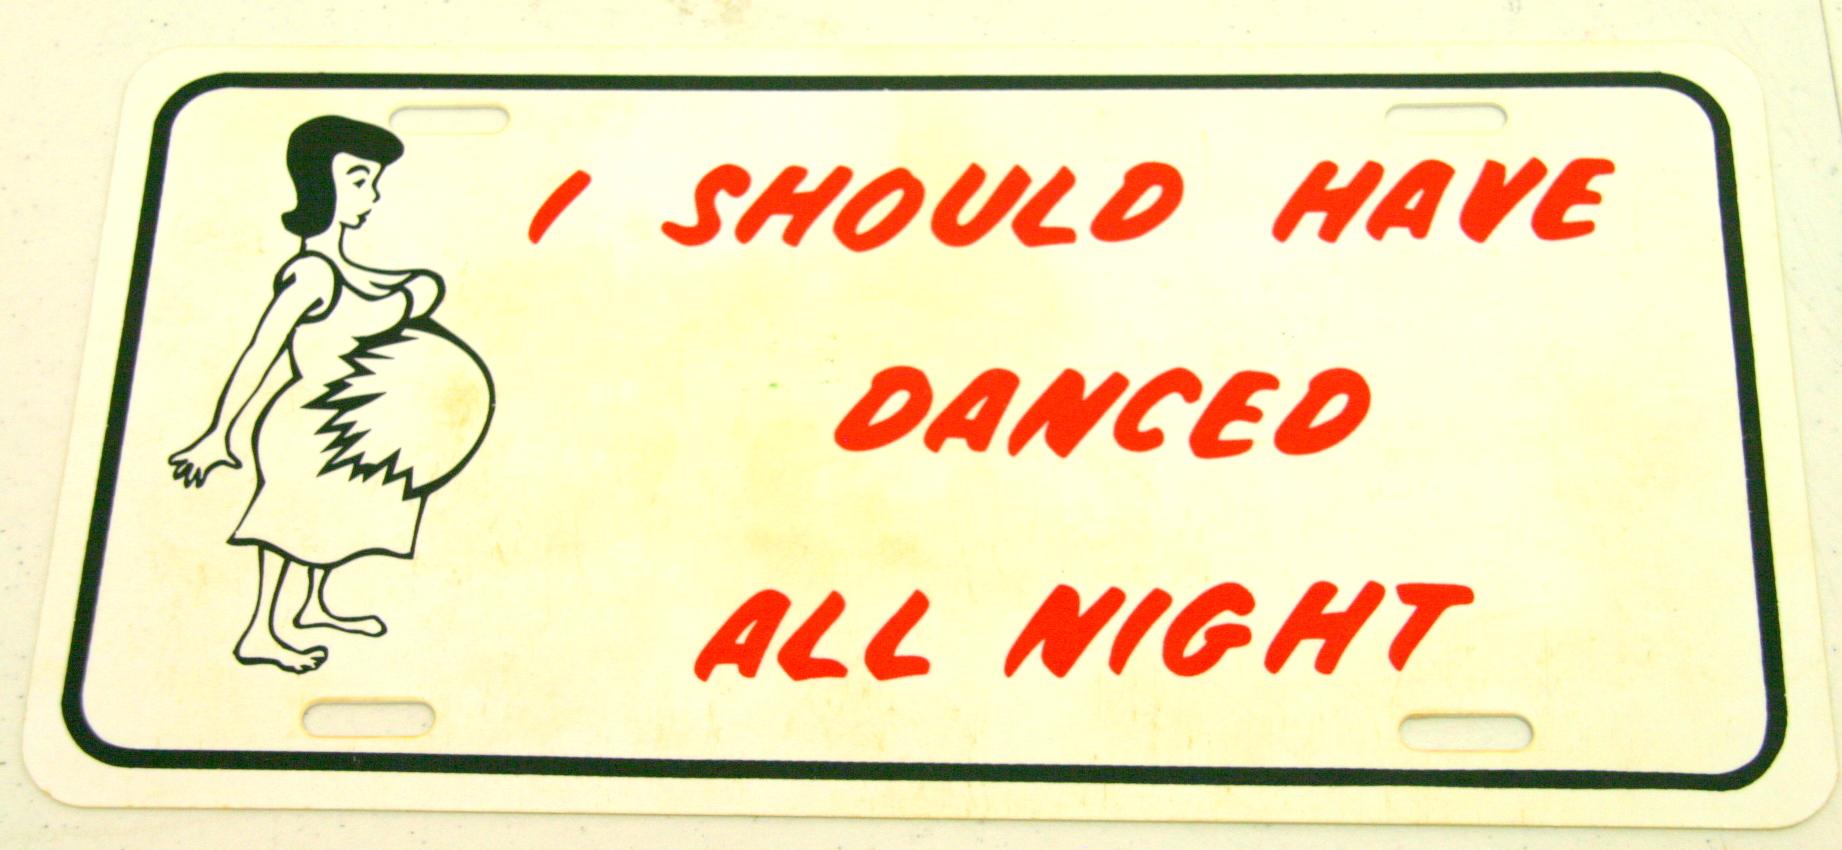 Vintage I Should Have Danced All Night Decorative